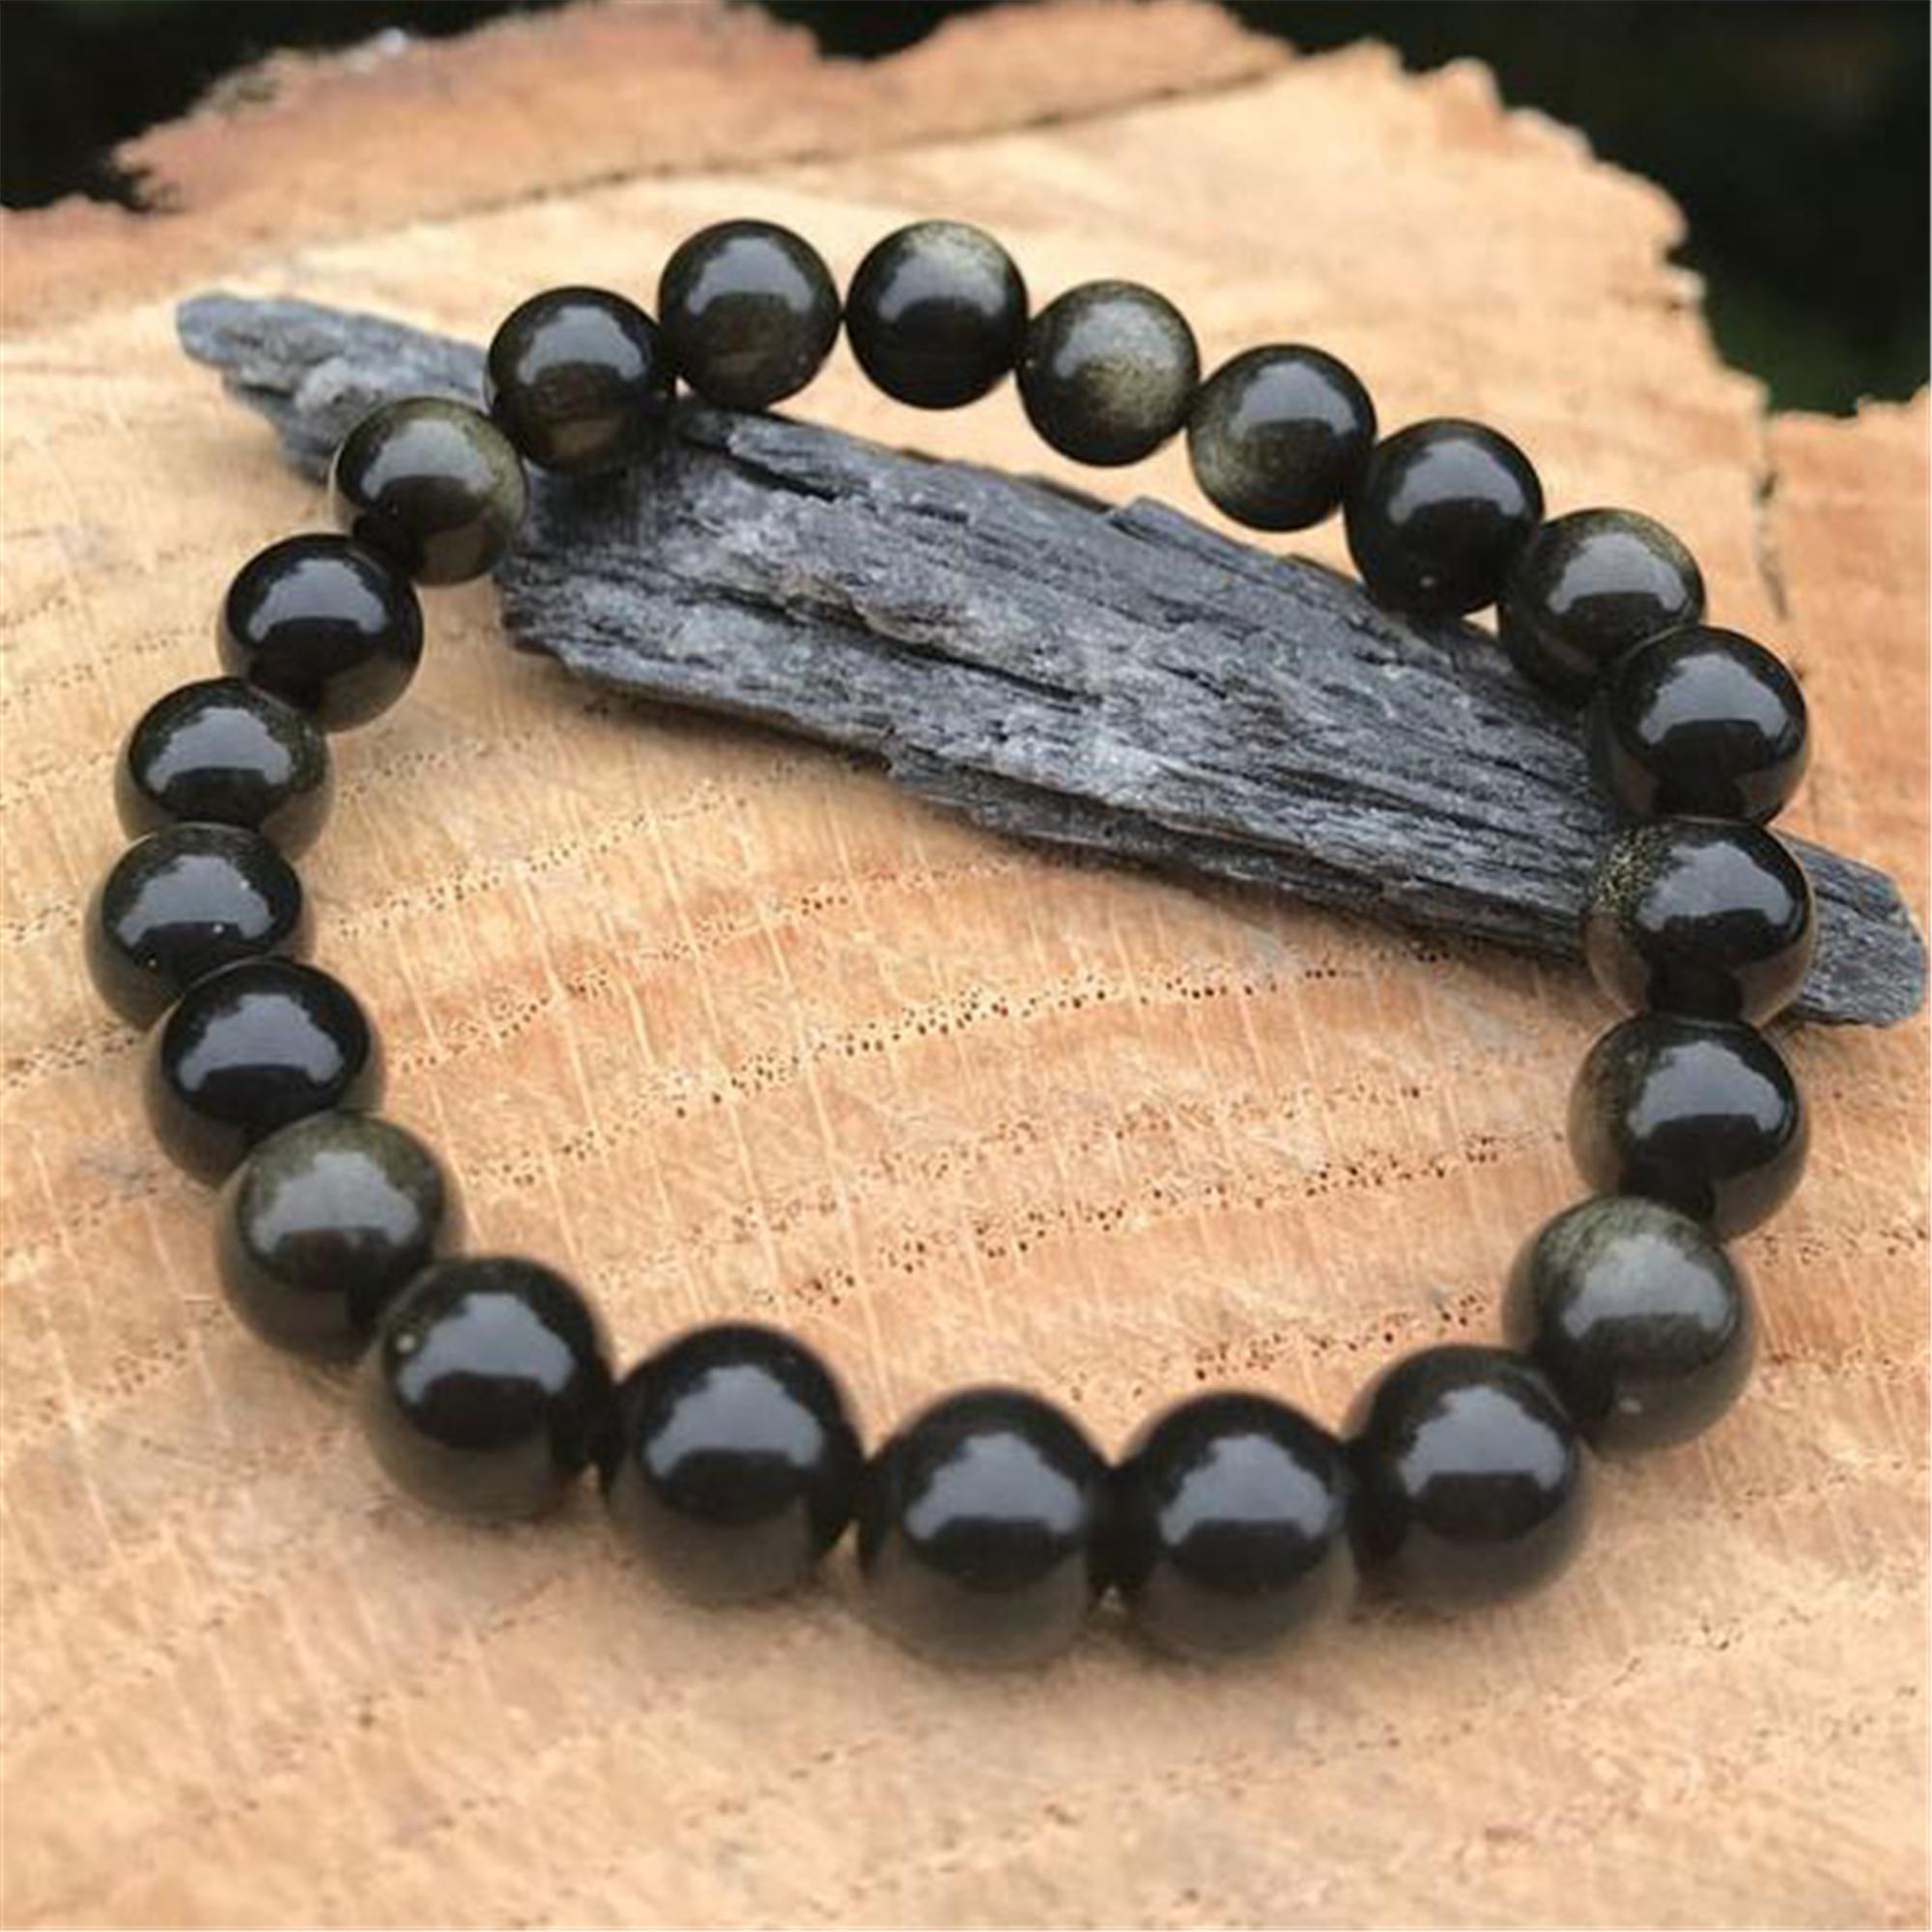 8mm Chakra Stone Frosted Obsidian Mala Buddhist Bracelet Yoga Natural Cheaply